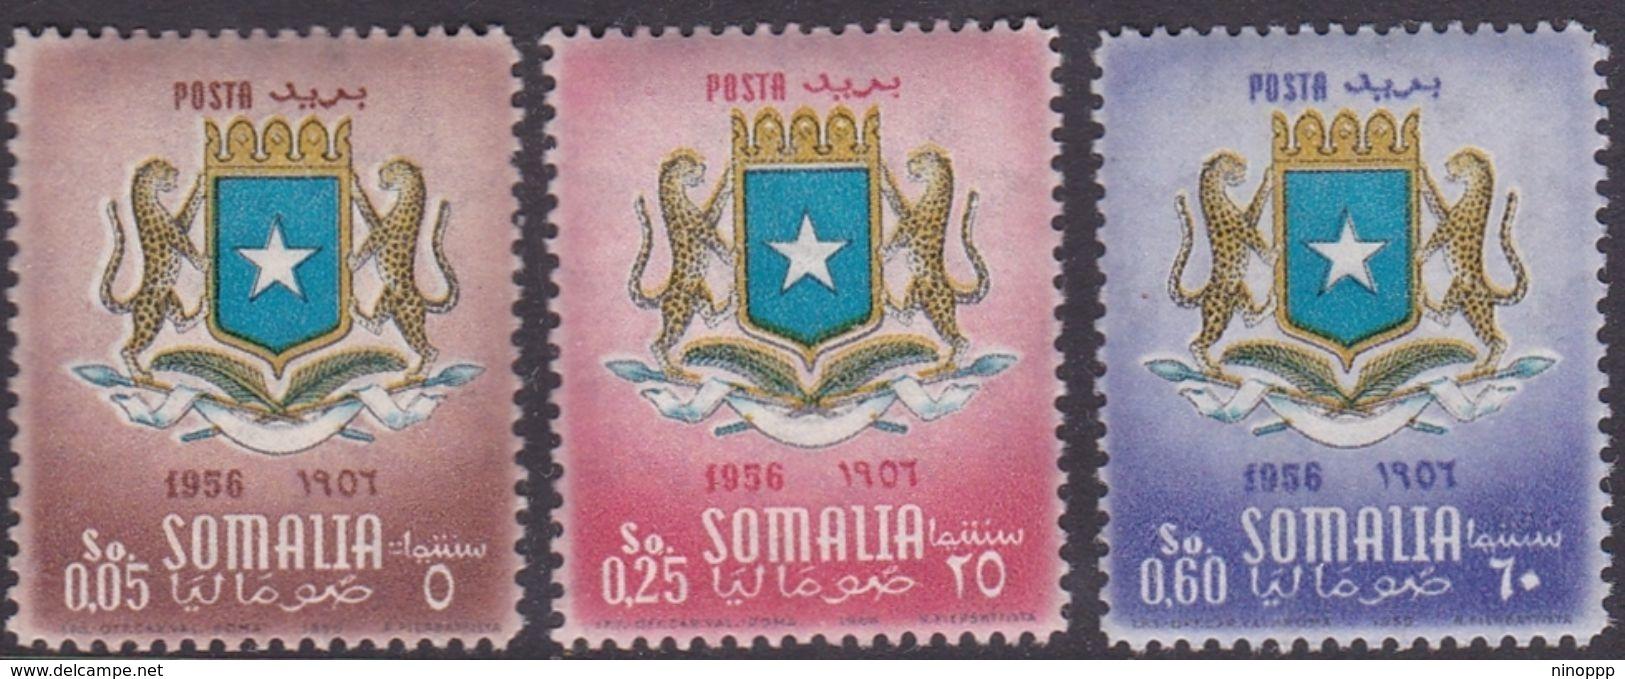 Somalia Scott 210-212 1957 Coat Of Arms, Mint Never Hinged - Somalia (AFIS)